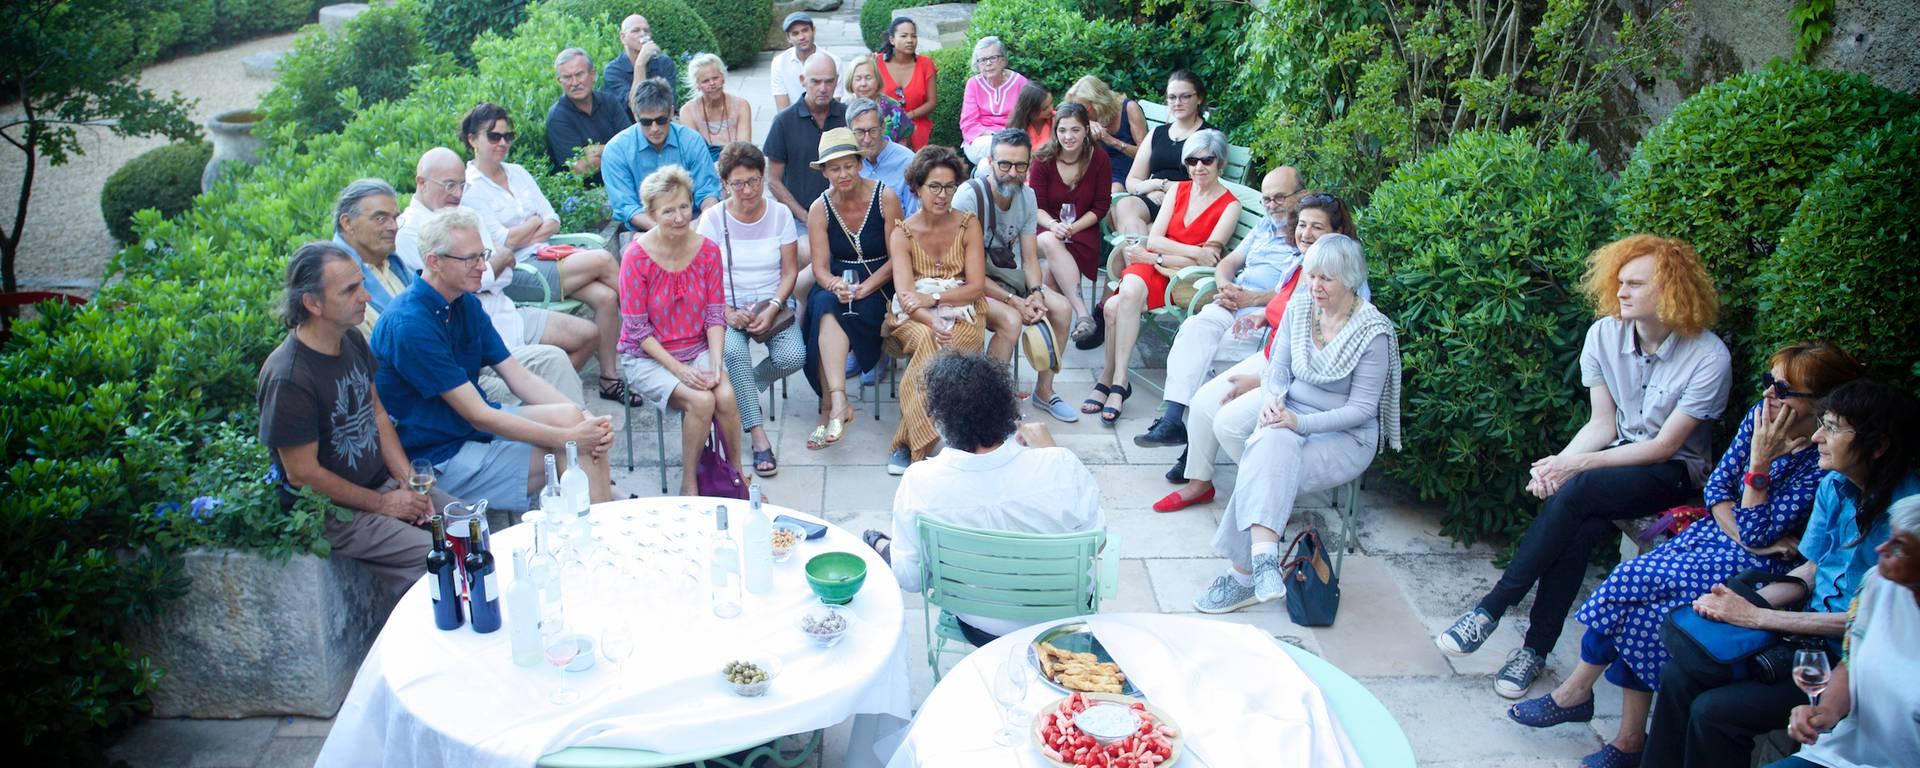 Ménerbes Maison Dora Maar Luberon Pays d'Apt Brown foundation